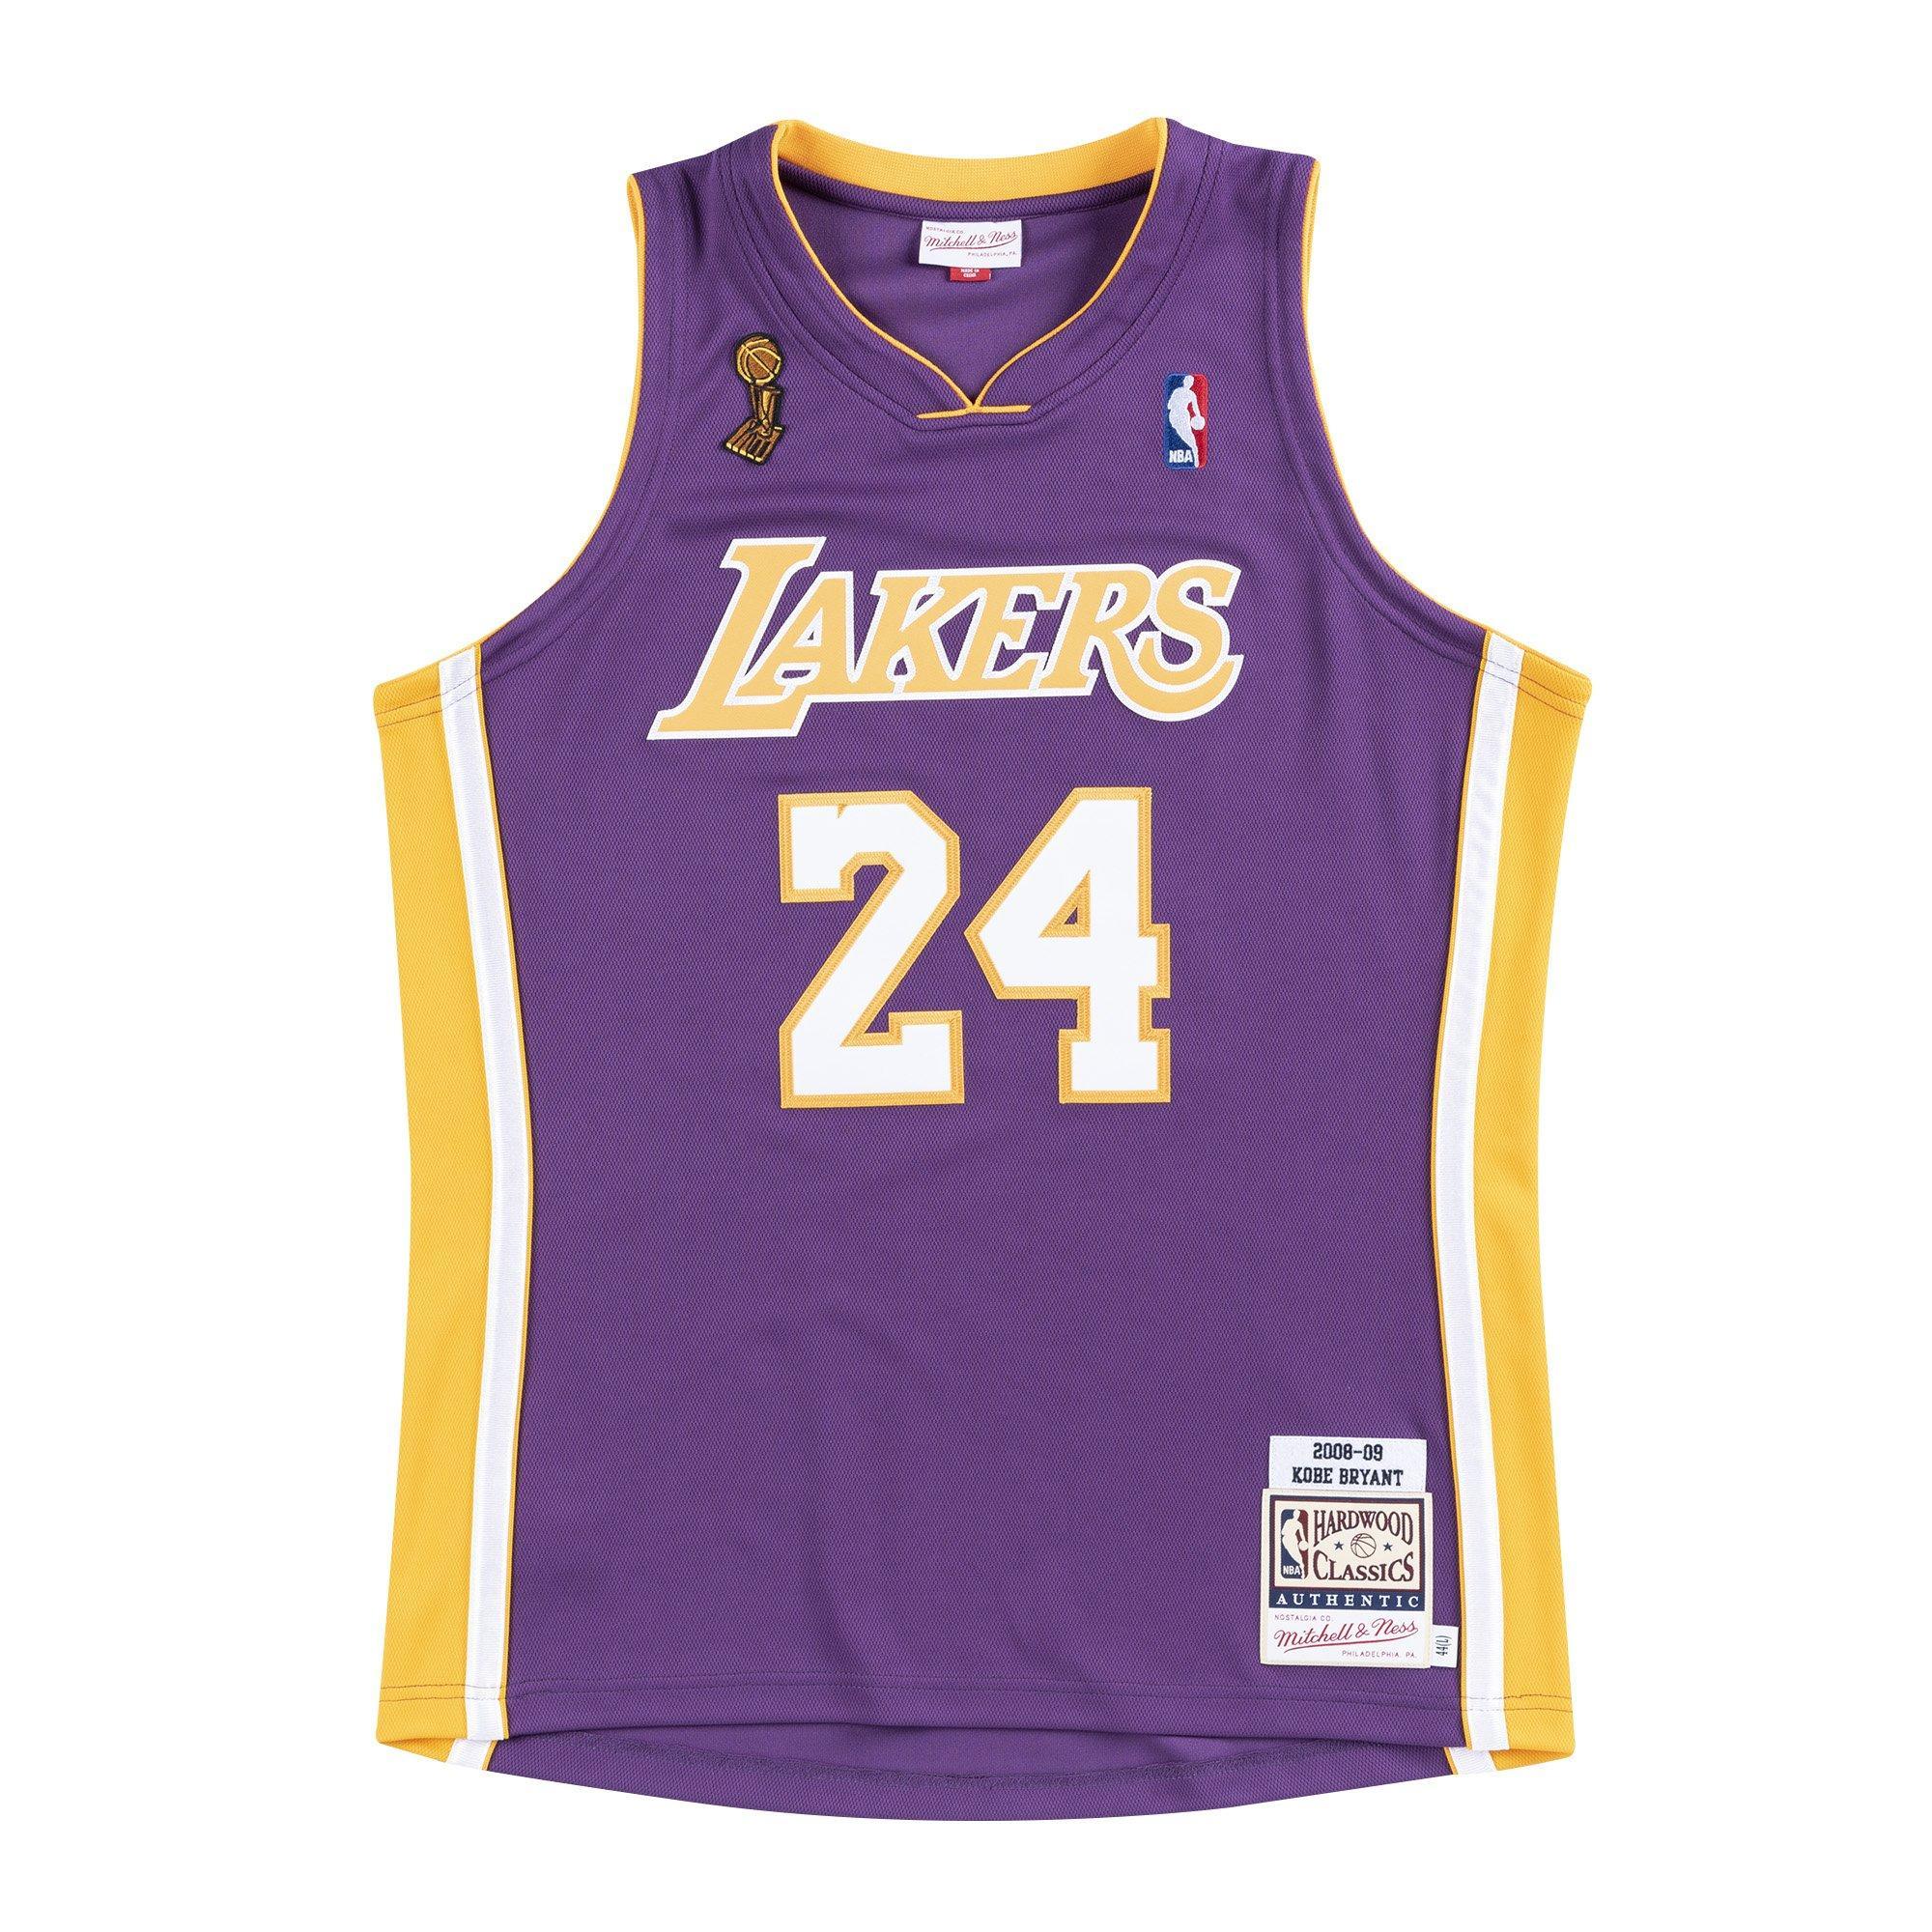 Mitchell & Ness Men's K. Bryant Los Angeles Lakers 08'-09' Authentic Hardwood Classics Jersey